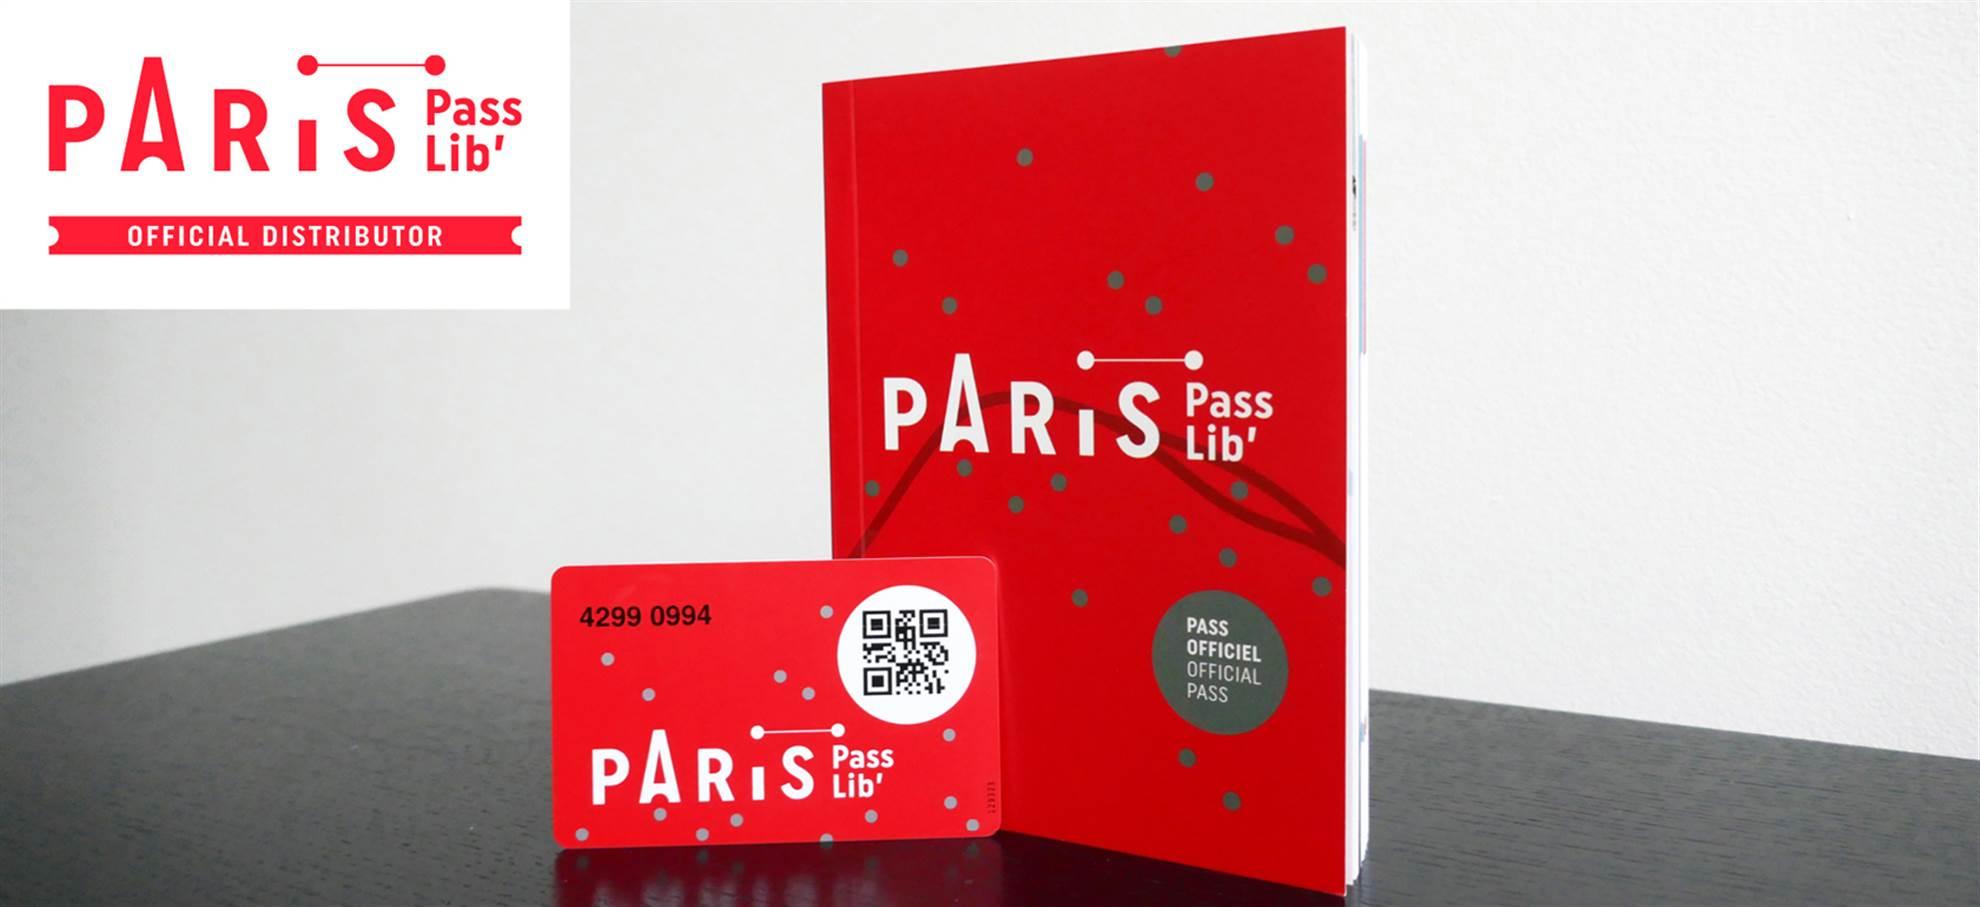 Париж PassLib' (Paris PassLib')